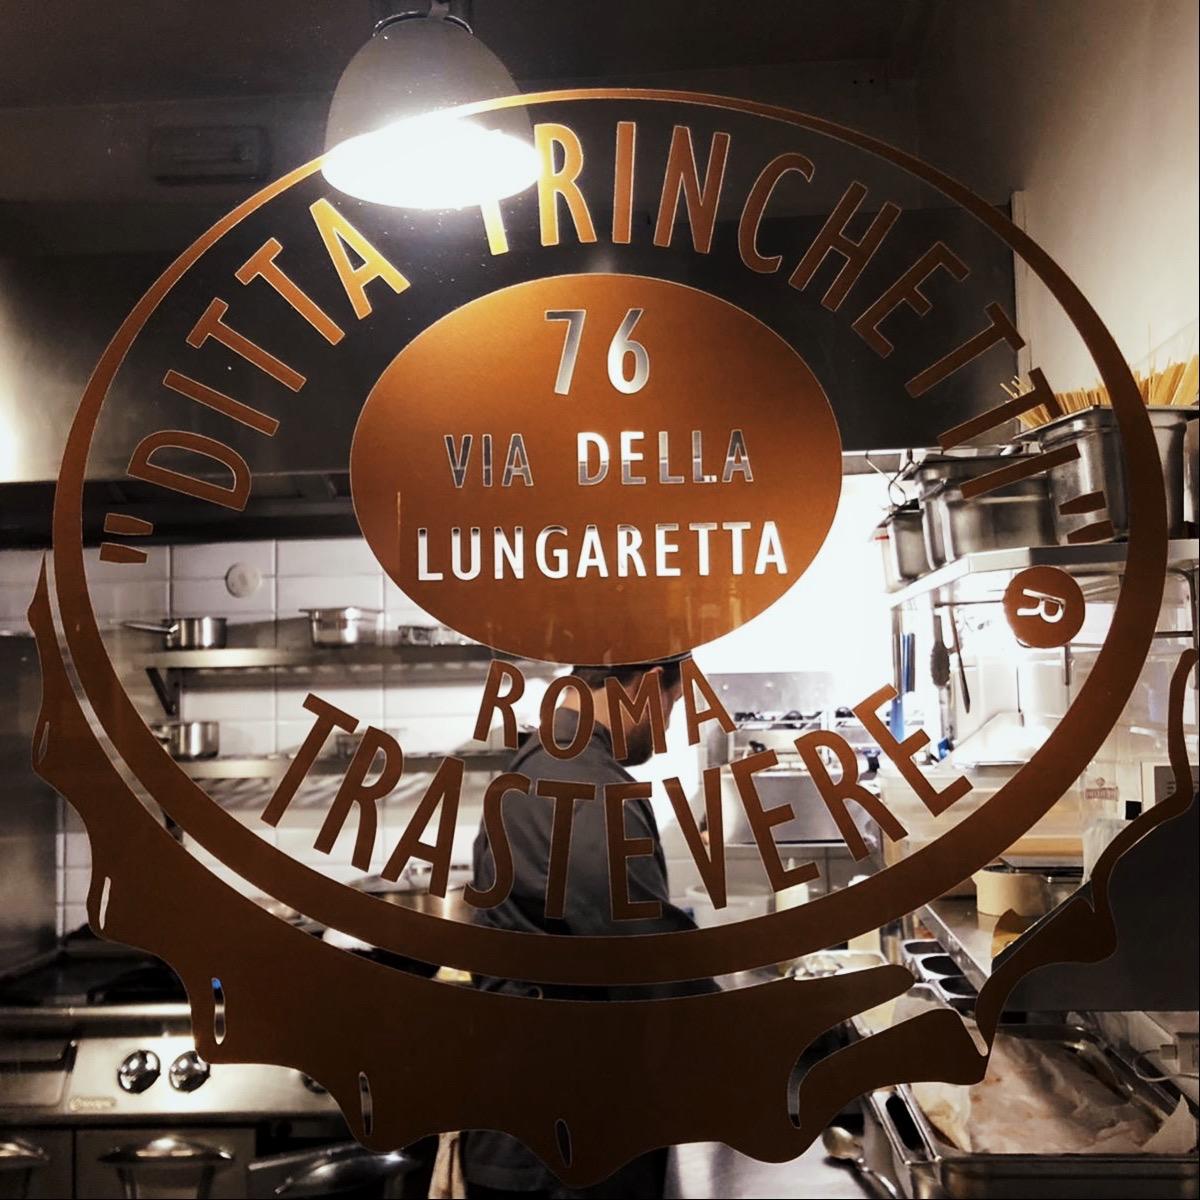 Staff Ditta Trinchetti